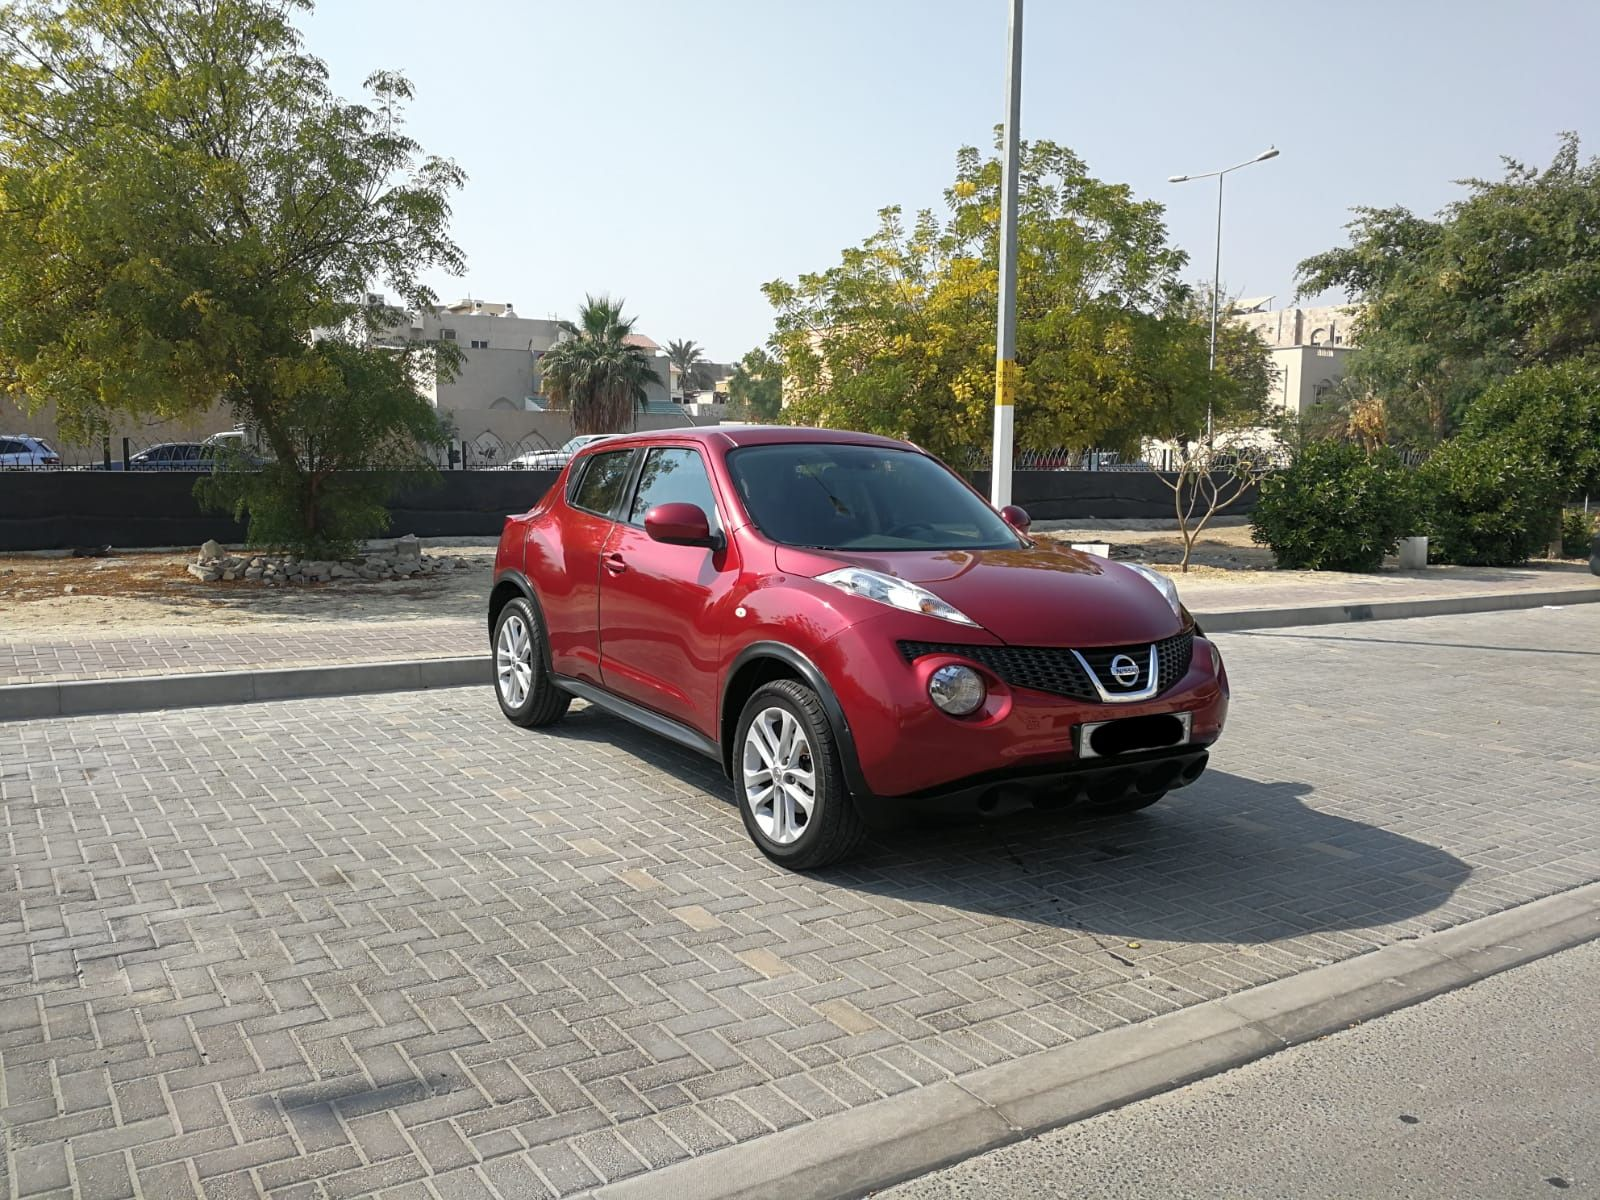 Nissan Juke 2012 (Red)